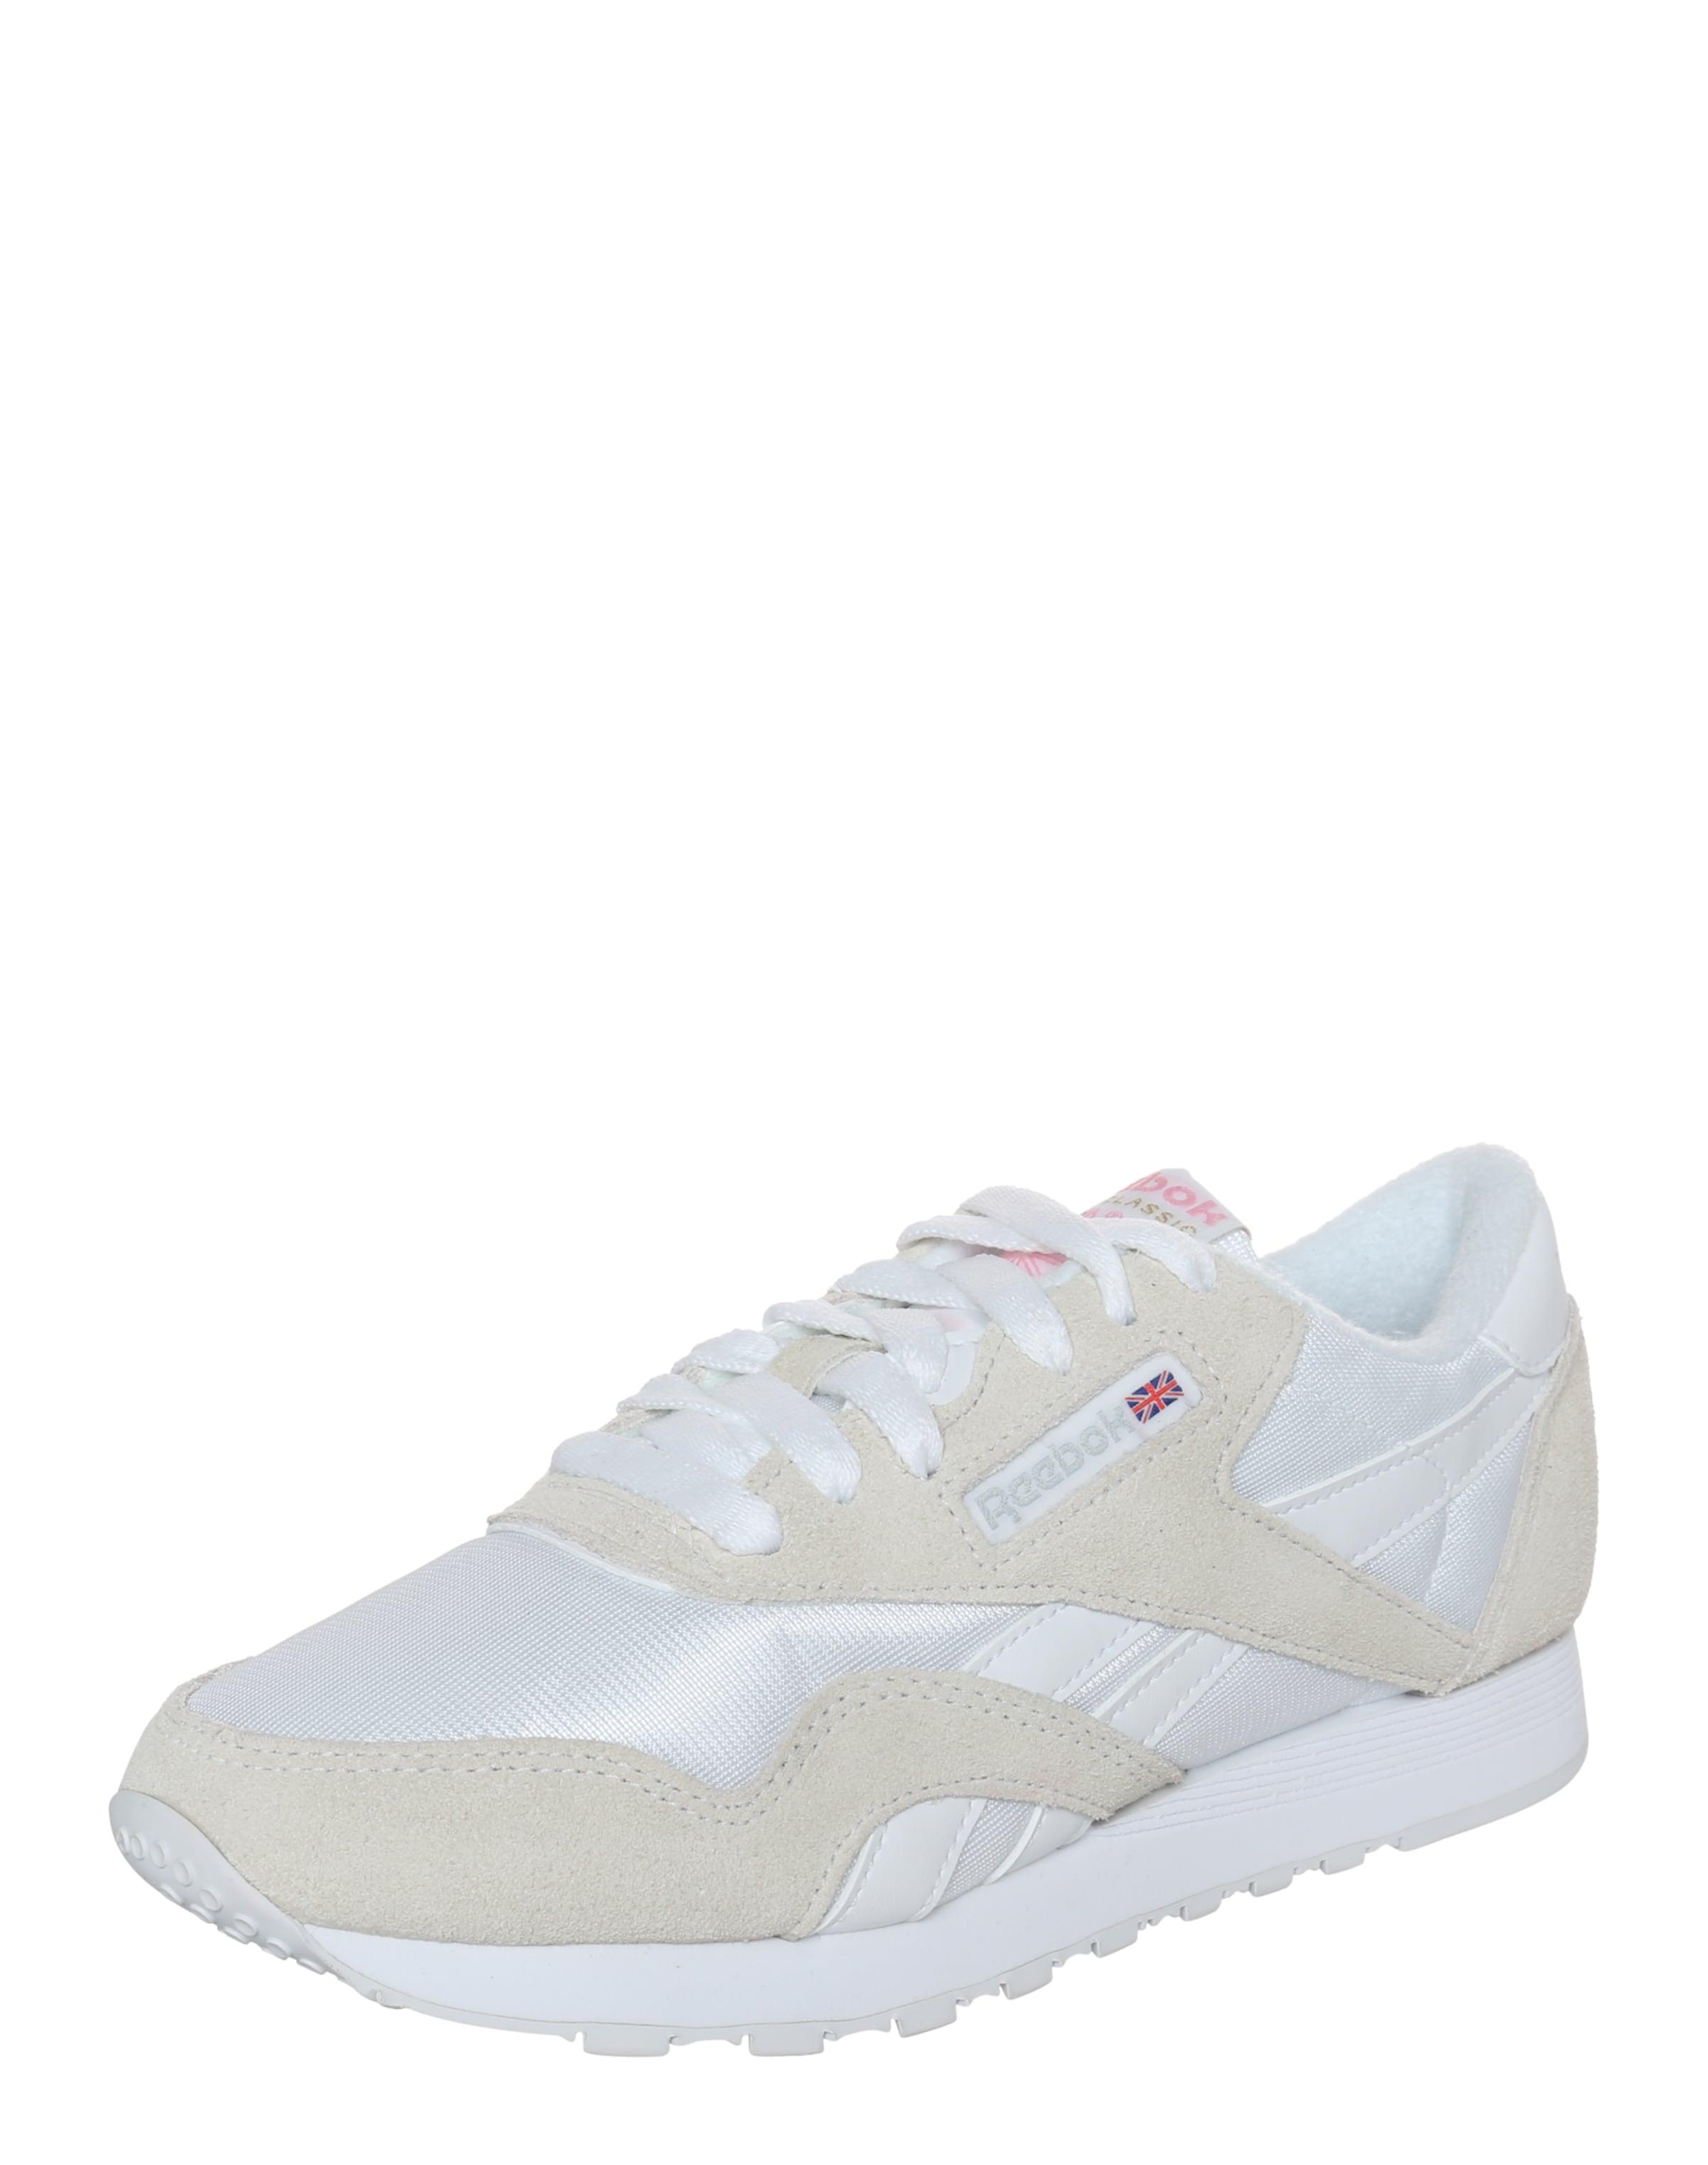 Reebok Classic In Sneaker Aus Materialmix BeigeWeiß XZiwOuTPk